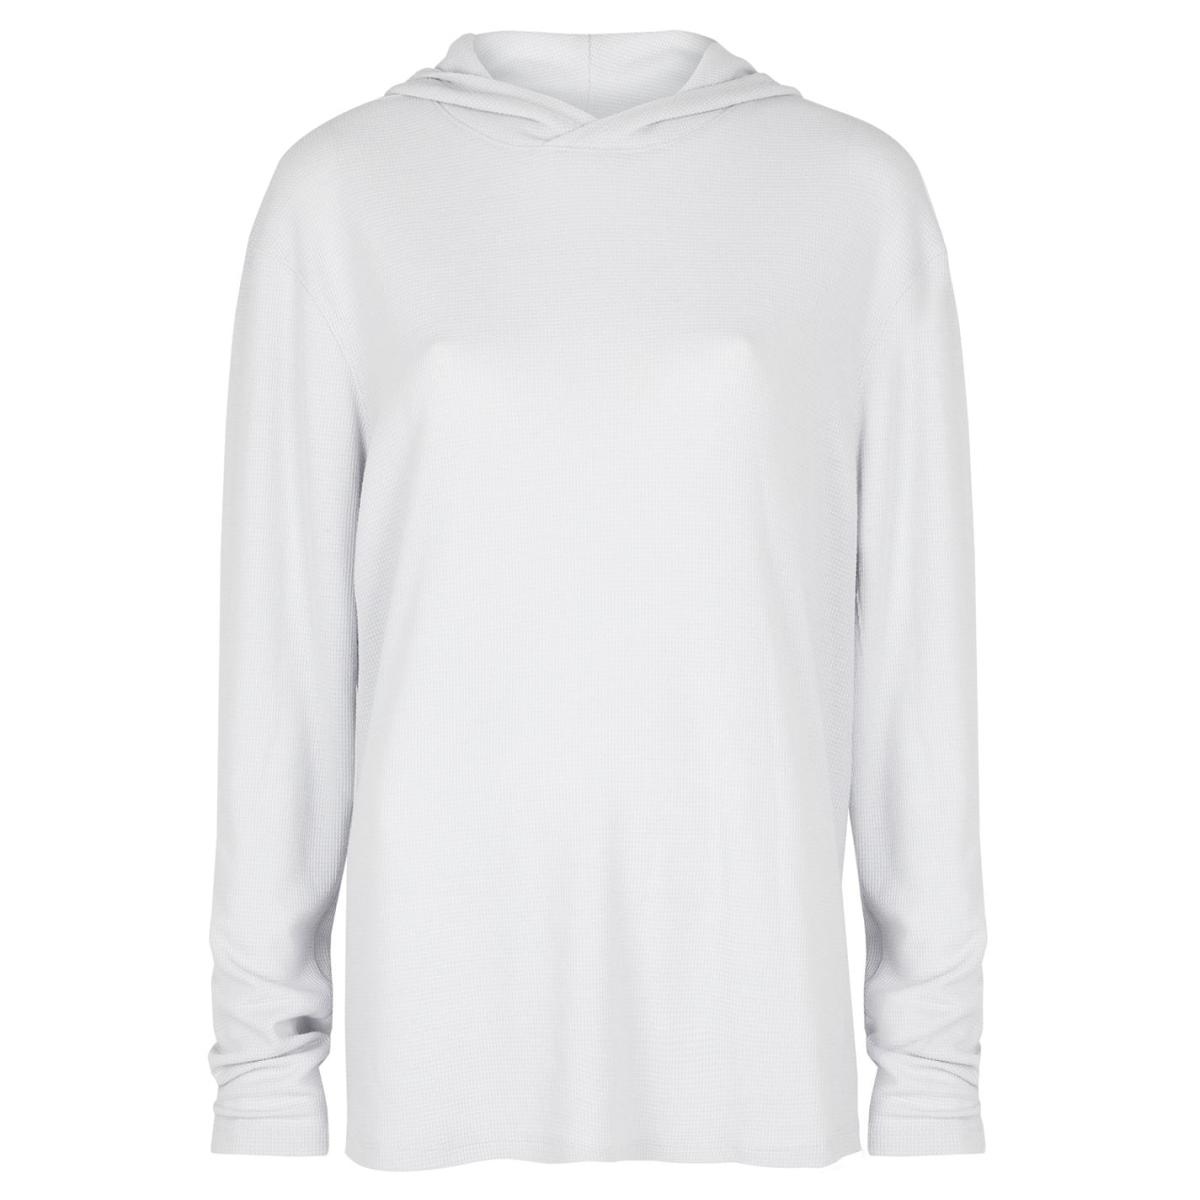 USA Pro Kapuzenpullover Sweatshirt Pullover Damen Kapuzenjacke Hoodie OTH 0316